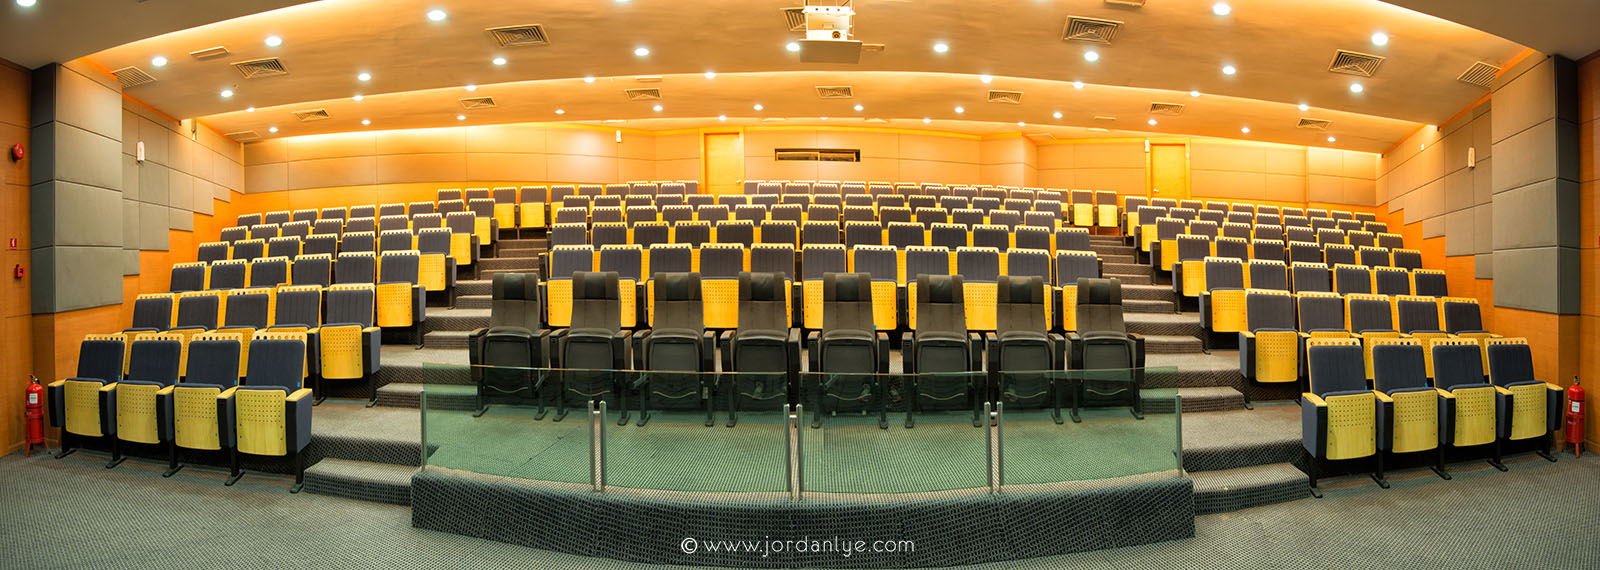 Penang_Interior Design_USM10_Jordan Lye.jpg